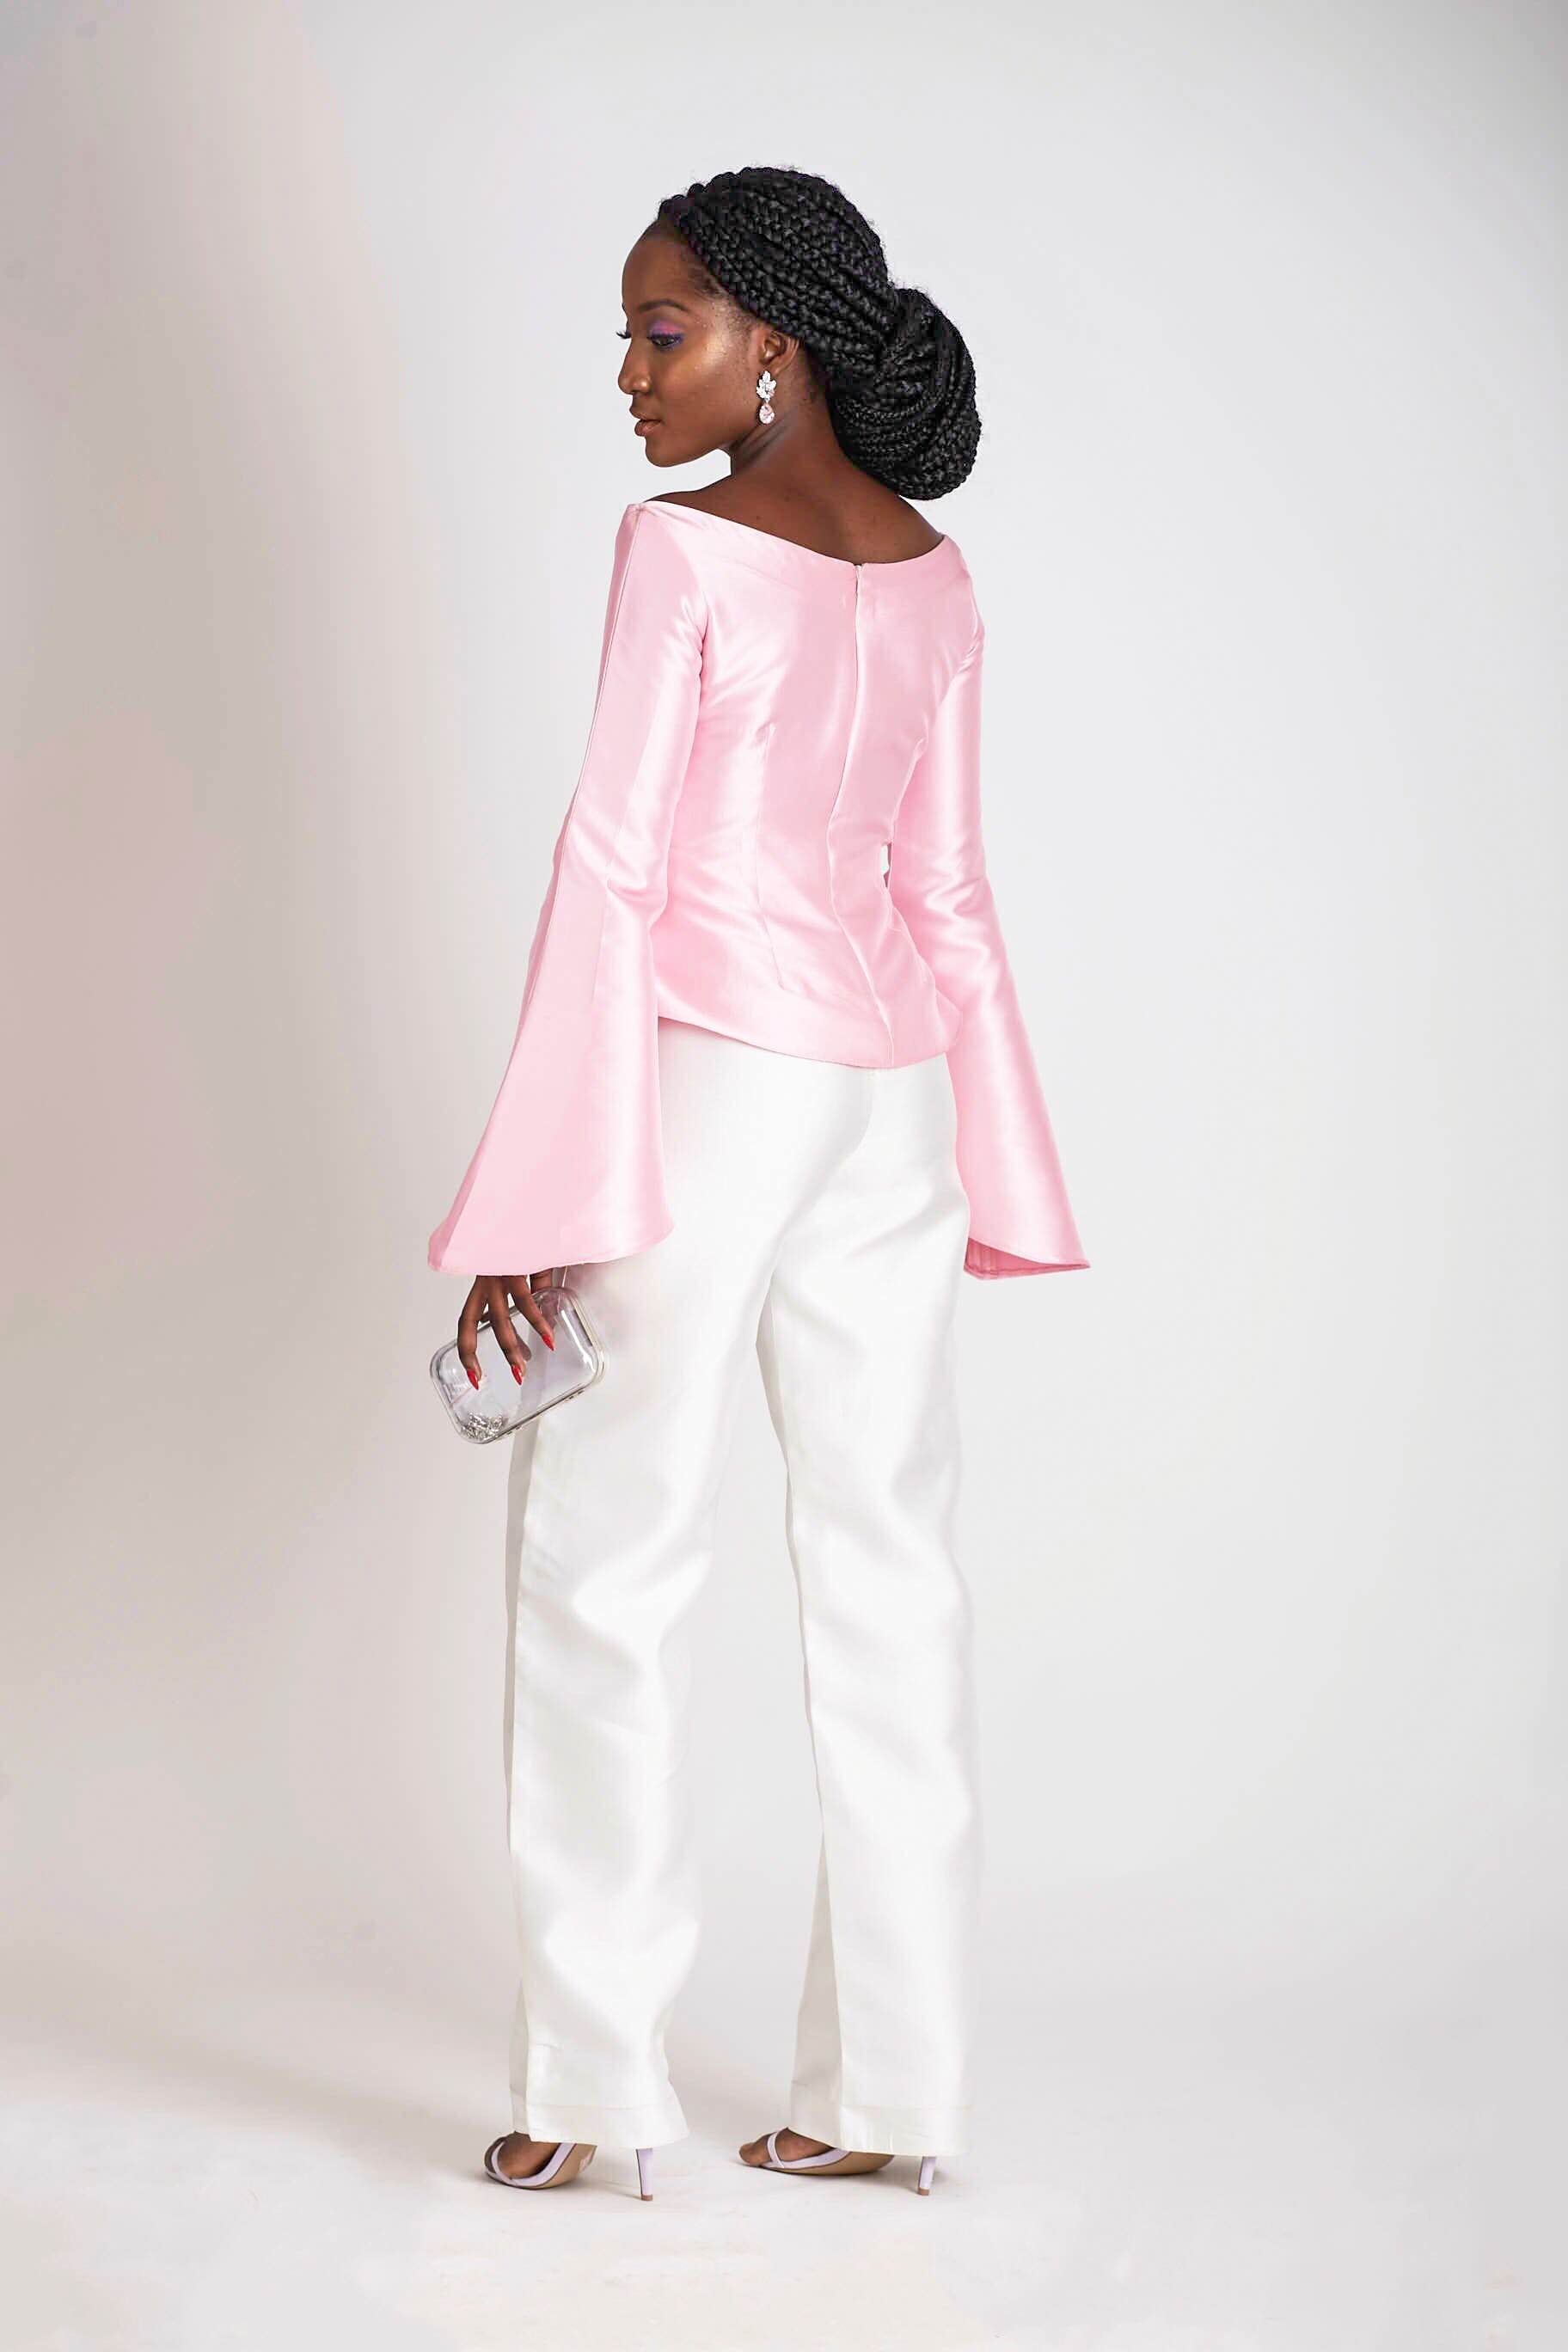 Imad Eduso - BN Style - Collection Lookbook - BellaNaija.com 09